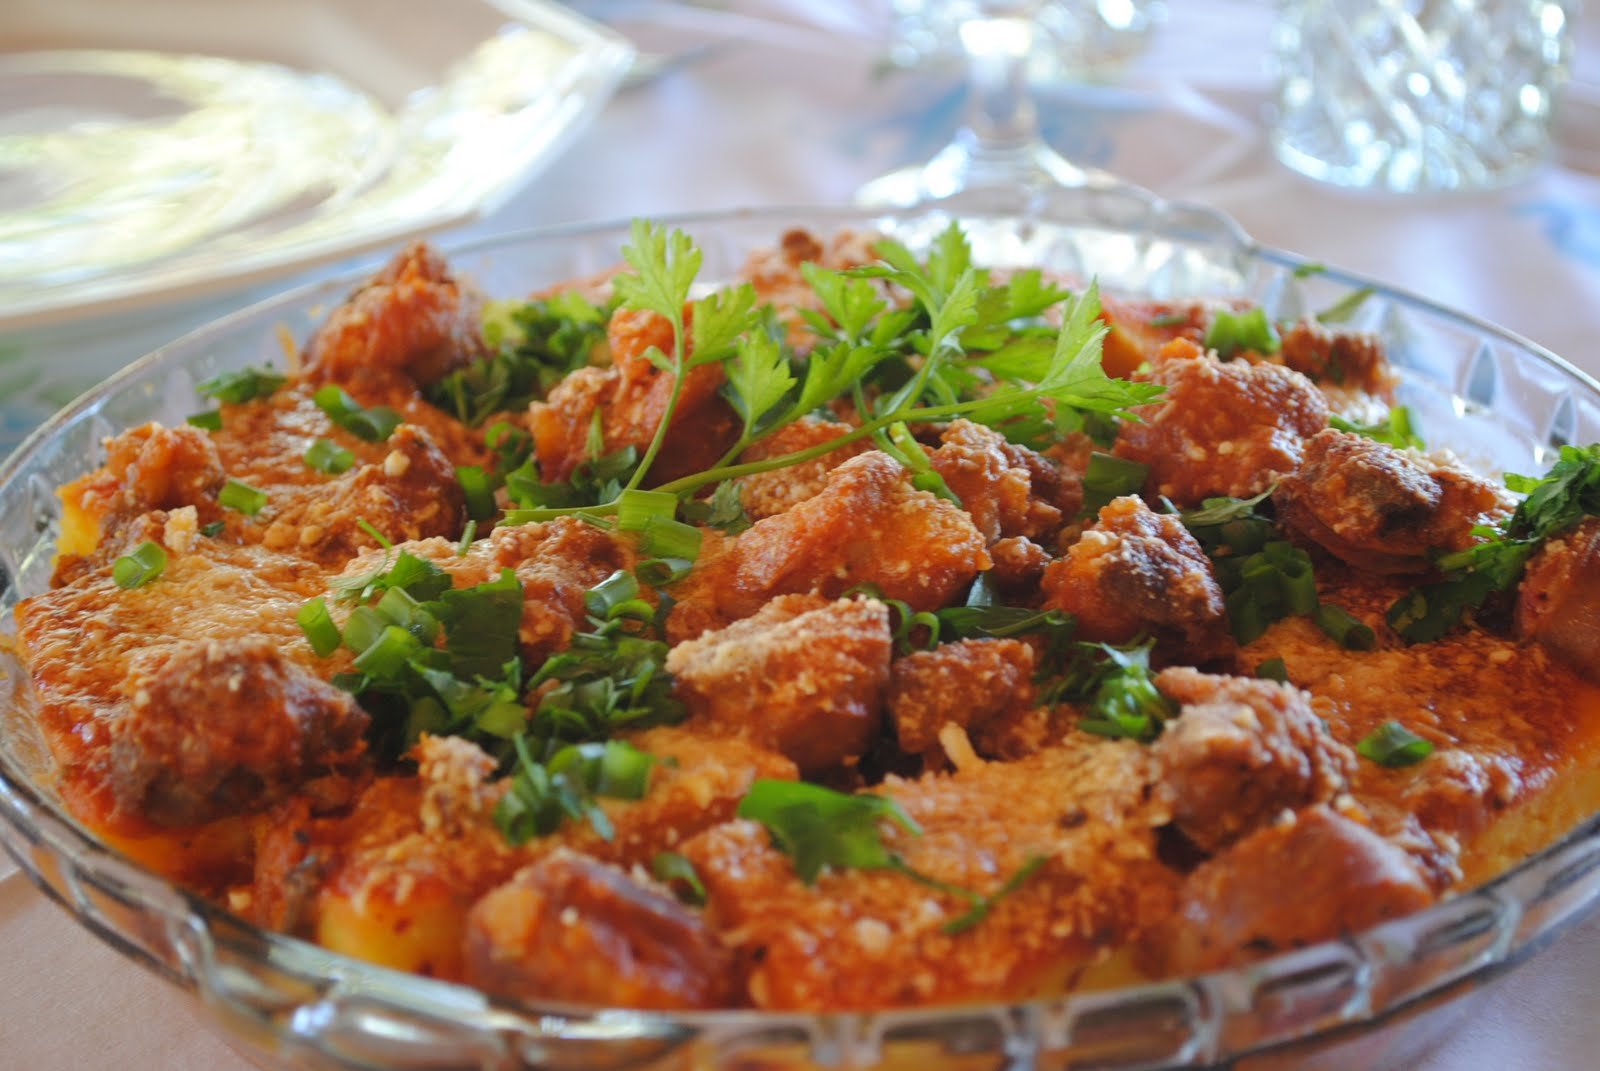 Comidinhas gostosas feitas aqui na ch cara michelli fuzari for Michellis menu